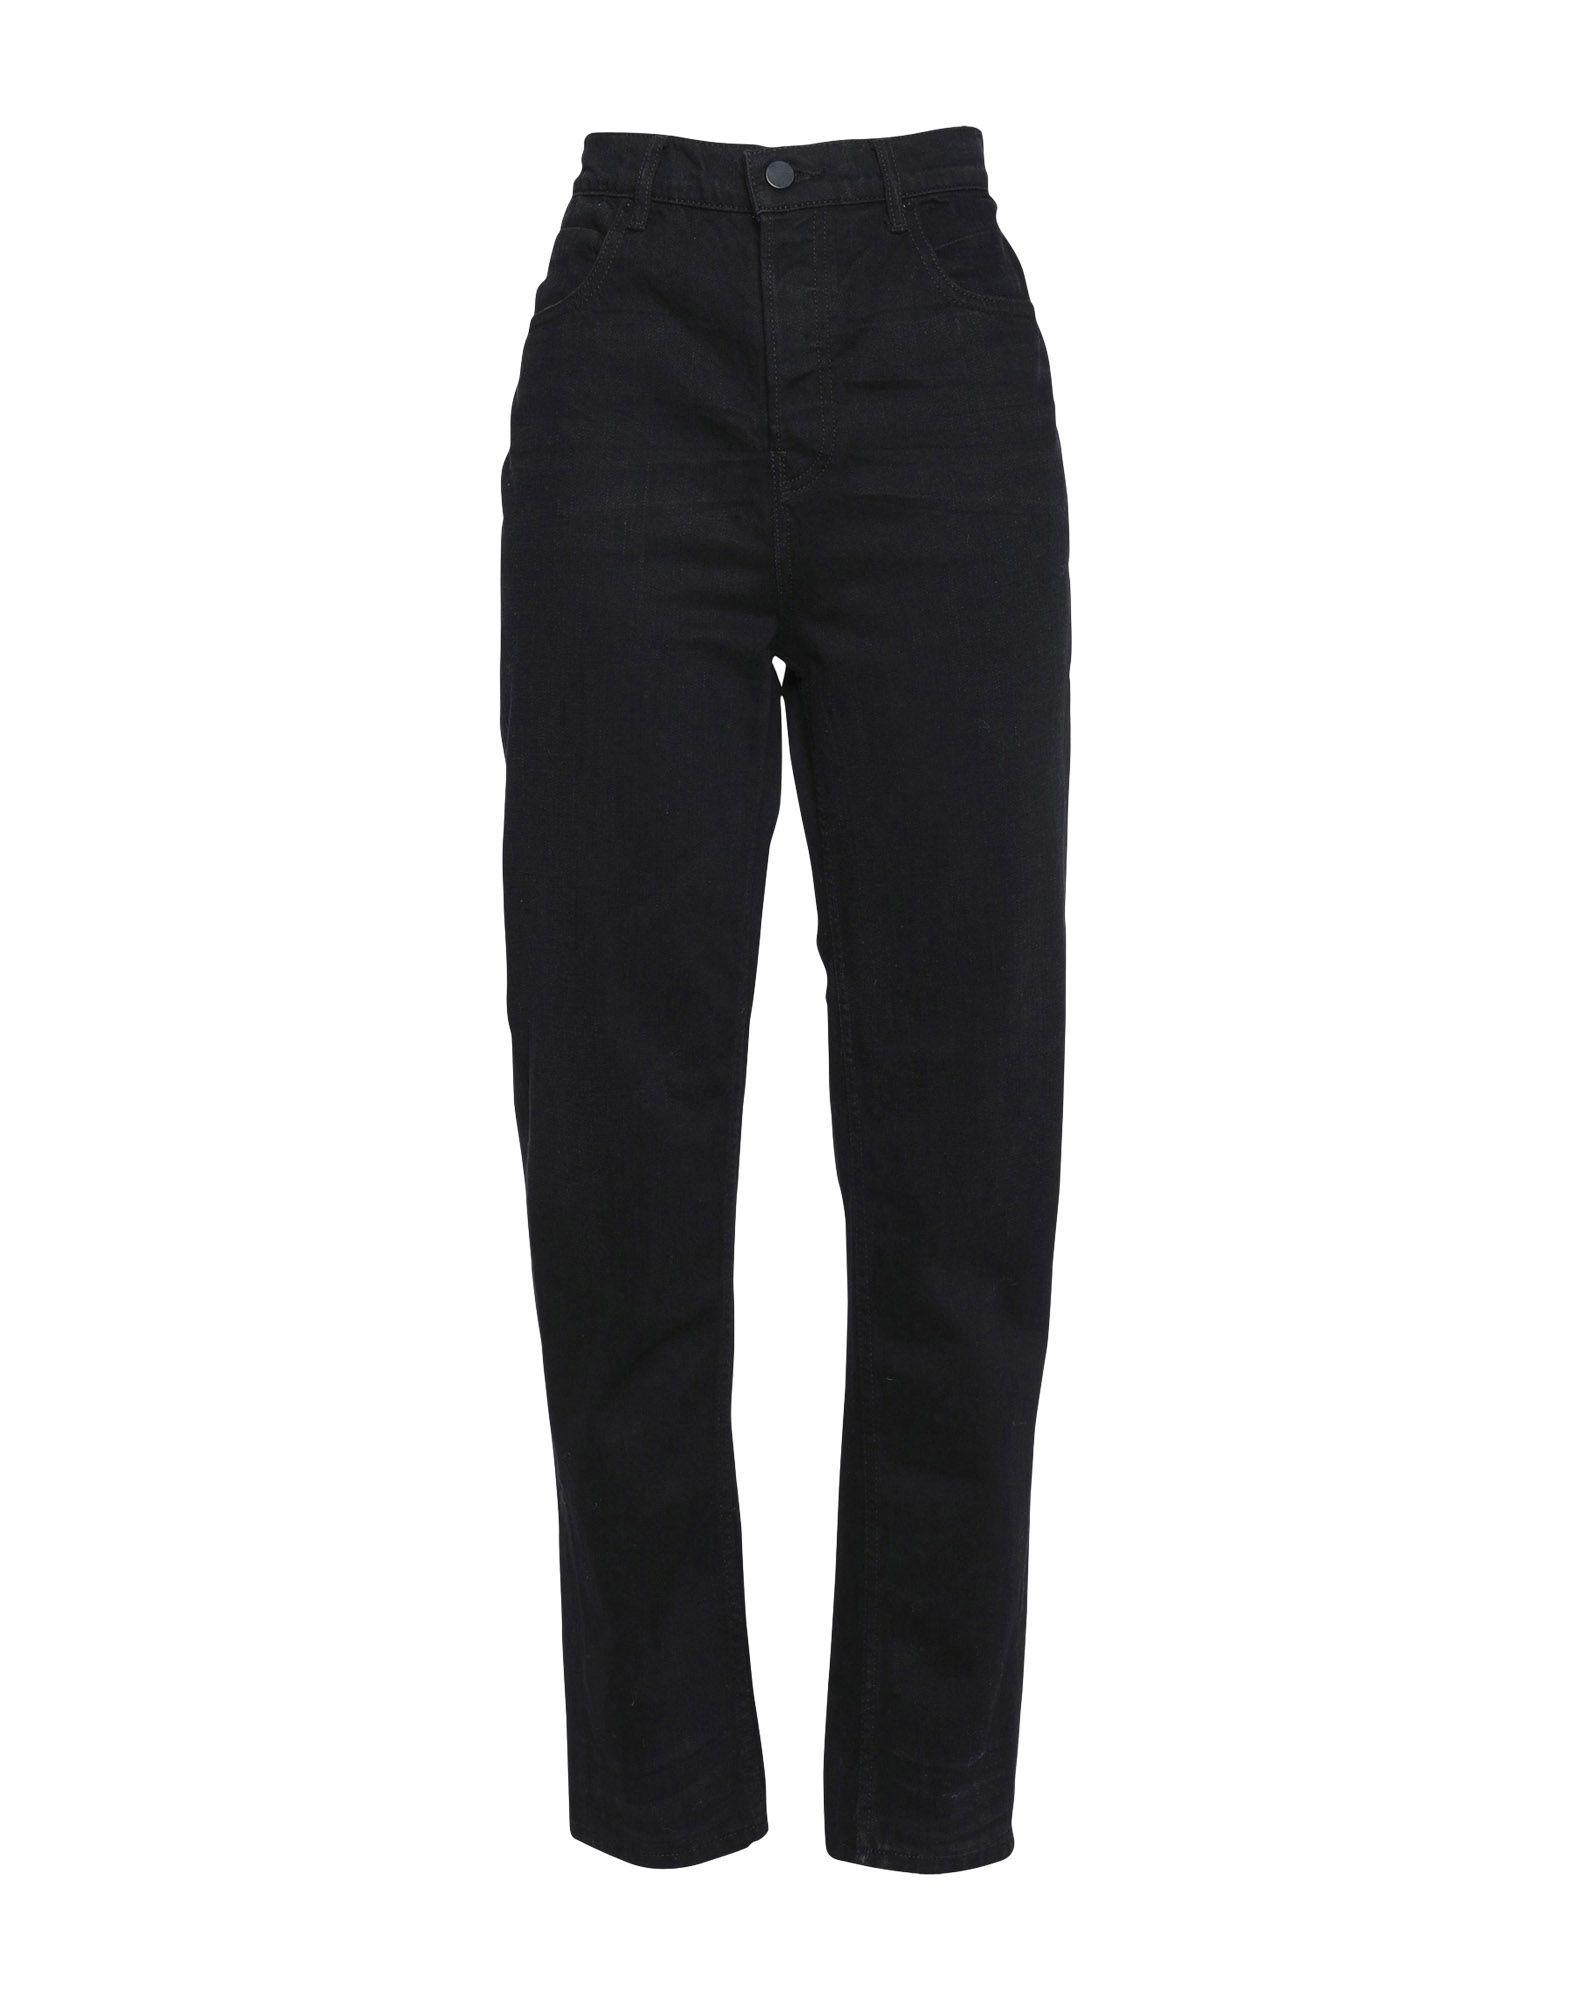 Pantaloni Jeans Alexander Wang Donna - Acquista online su rARto